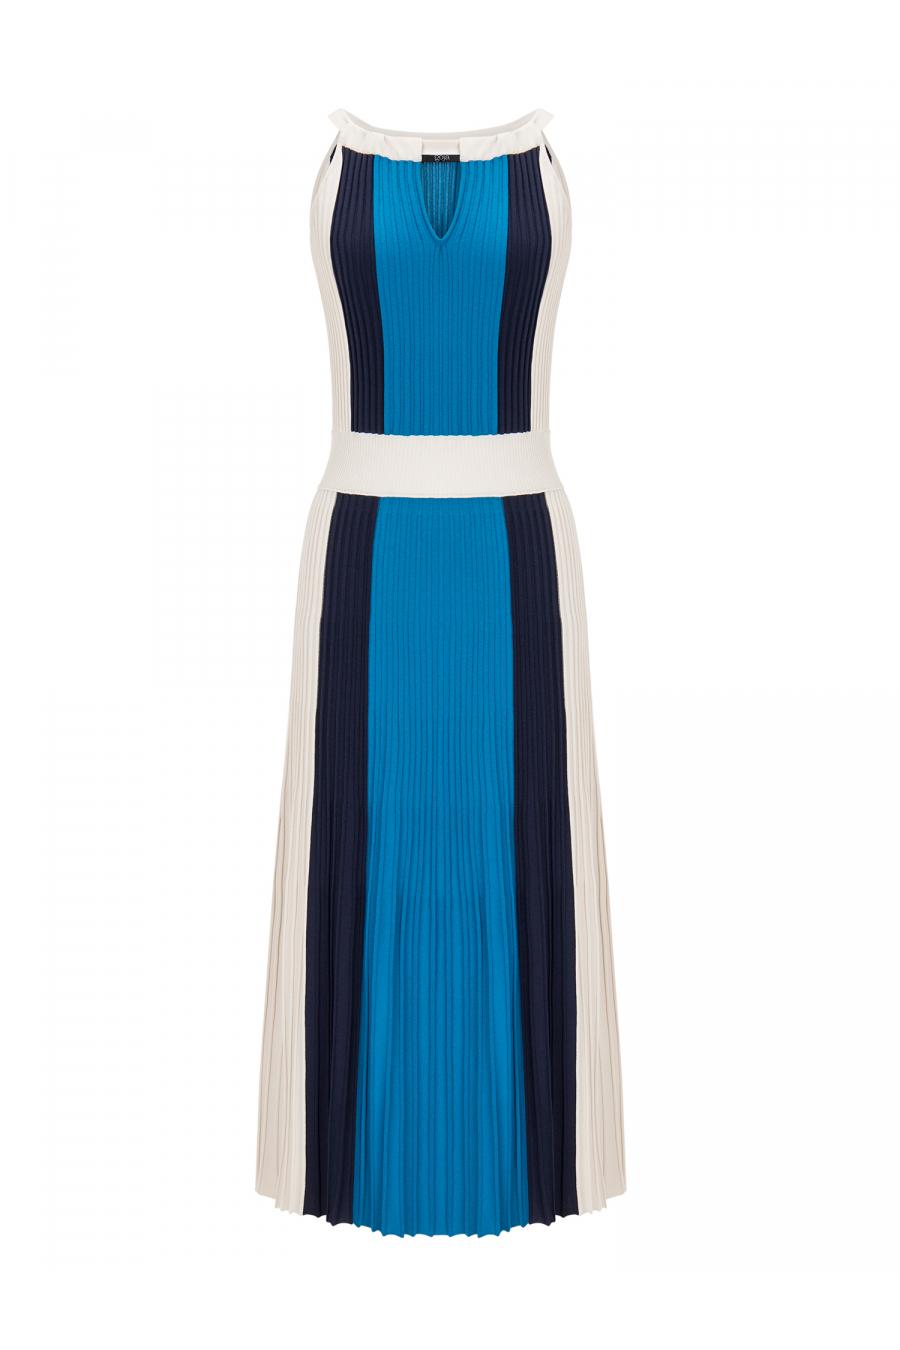 Three Color Dress Blue